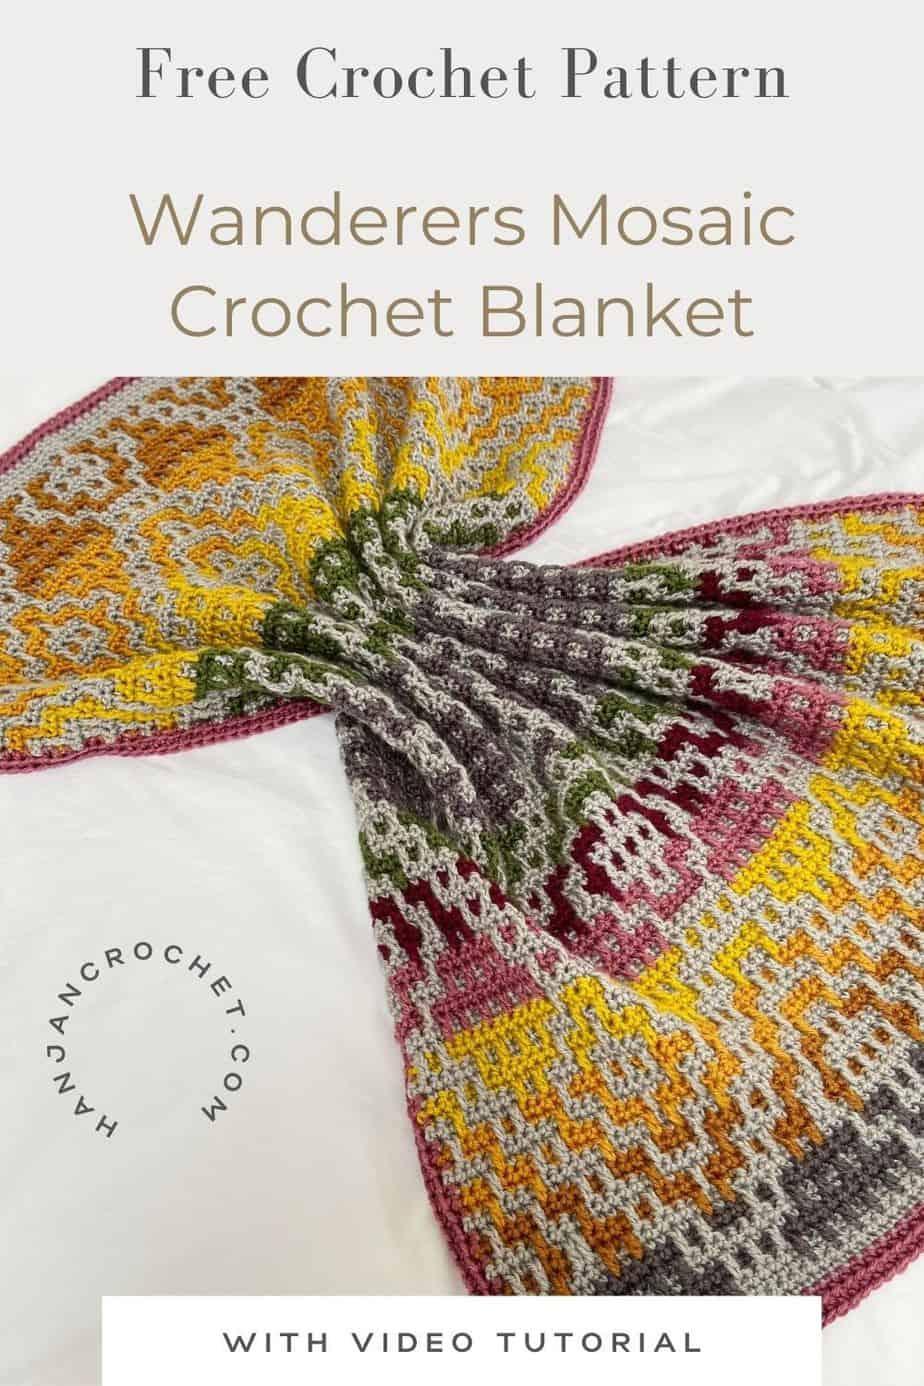 Wanderers Mosaic Crochet Blanket Pattern pin 4